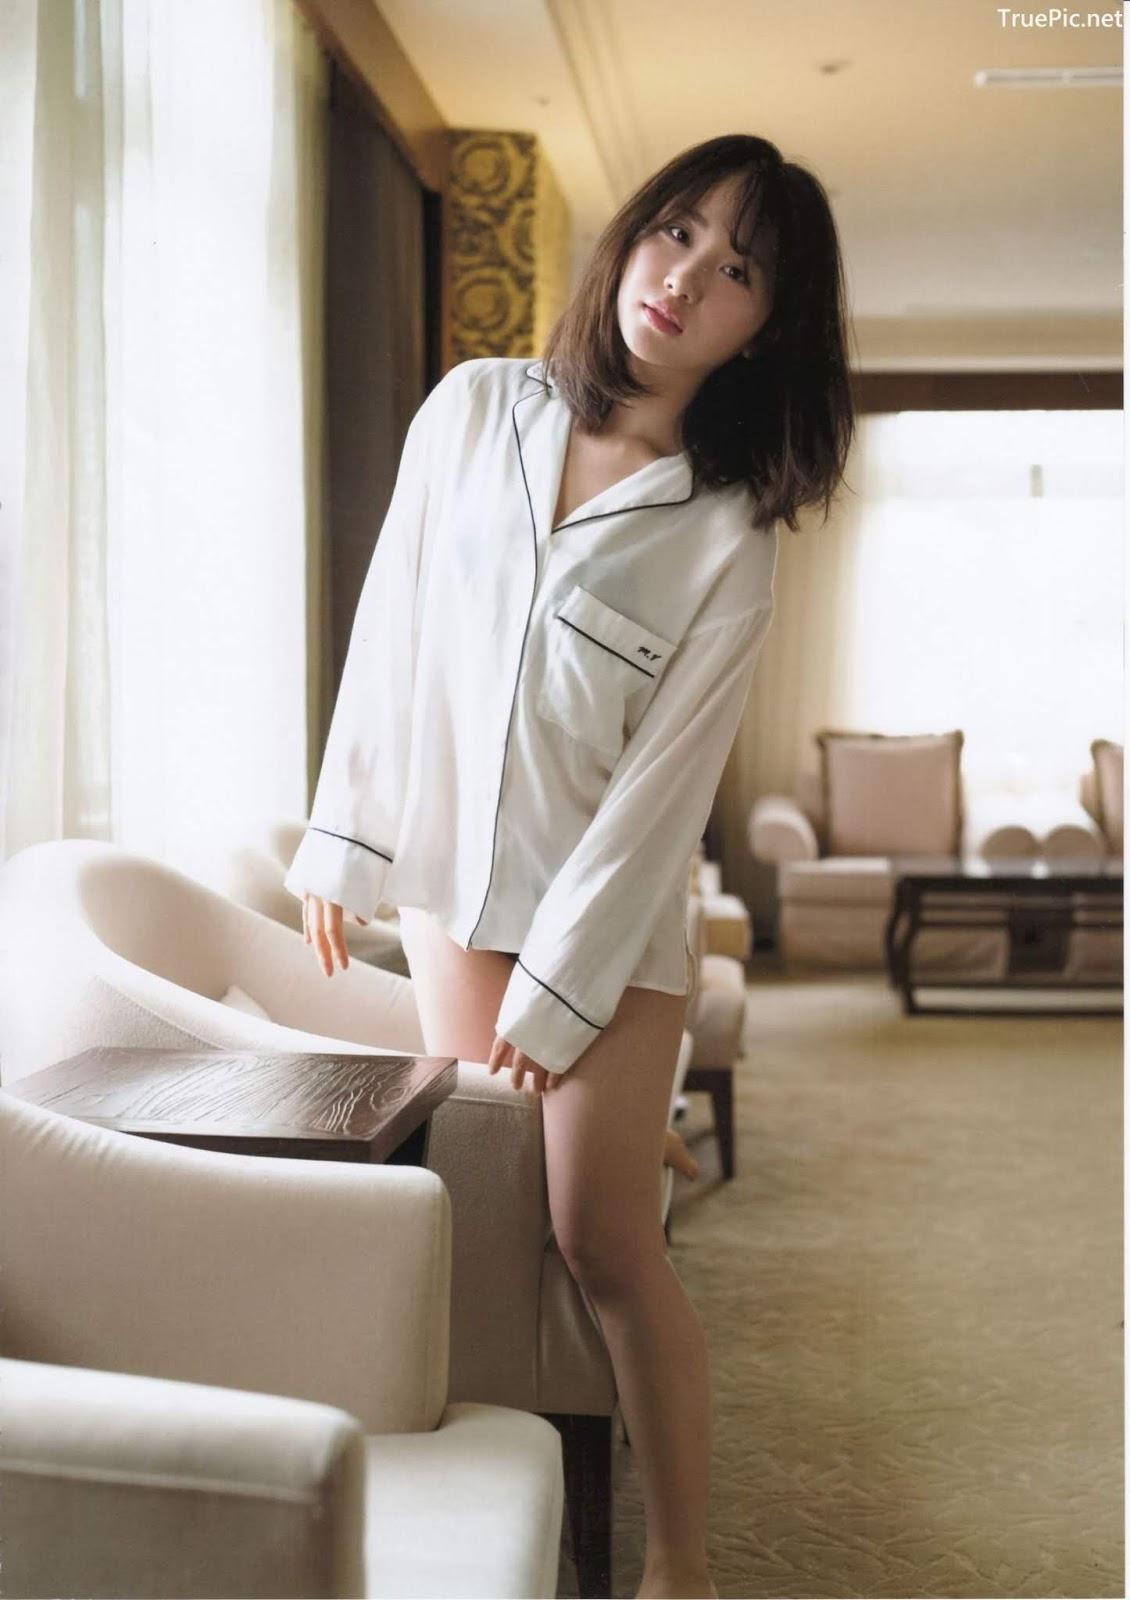 Image Japanese Beauty - Juri Takahashi - Ambiguous Self - TruePic.net - Picture-2